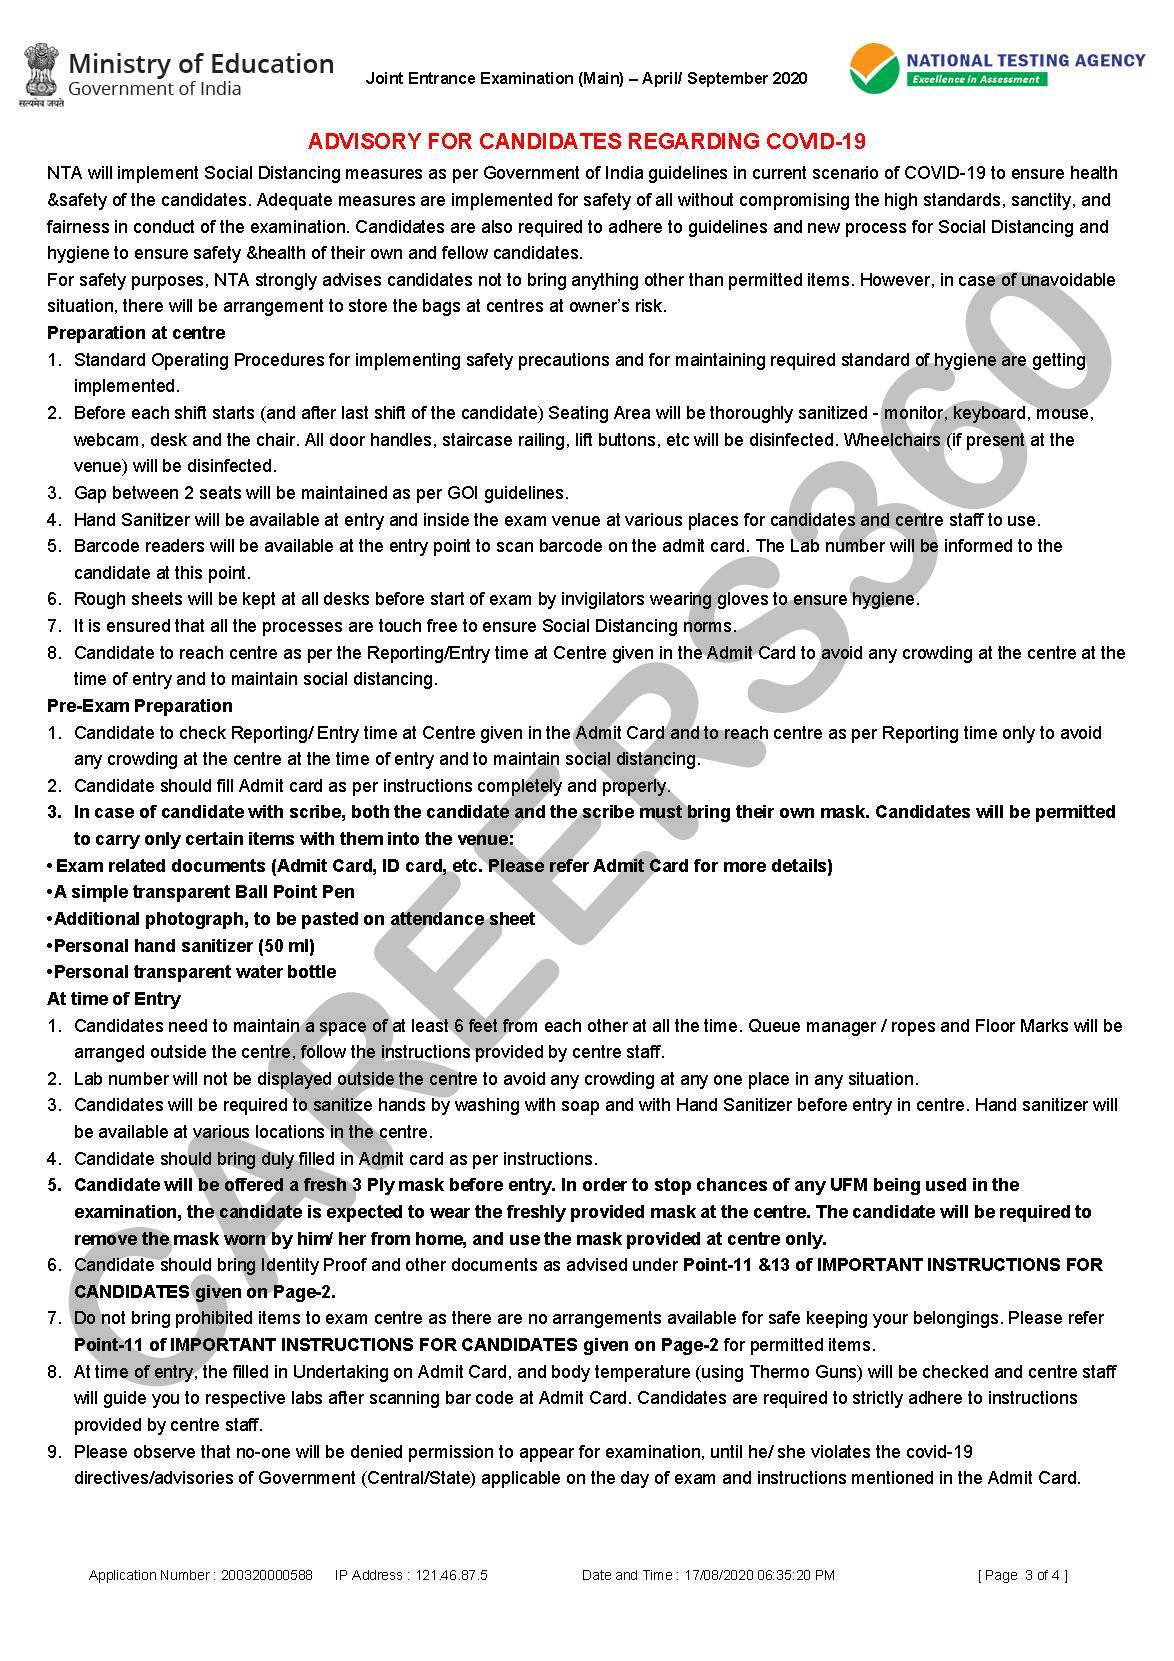 JEE Main 2020 Exam Guidelines-2